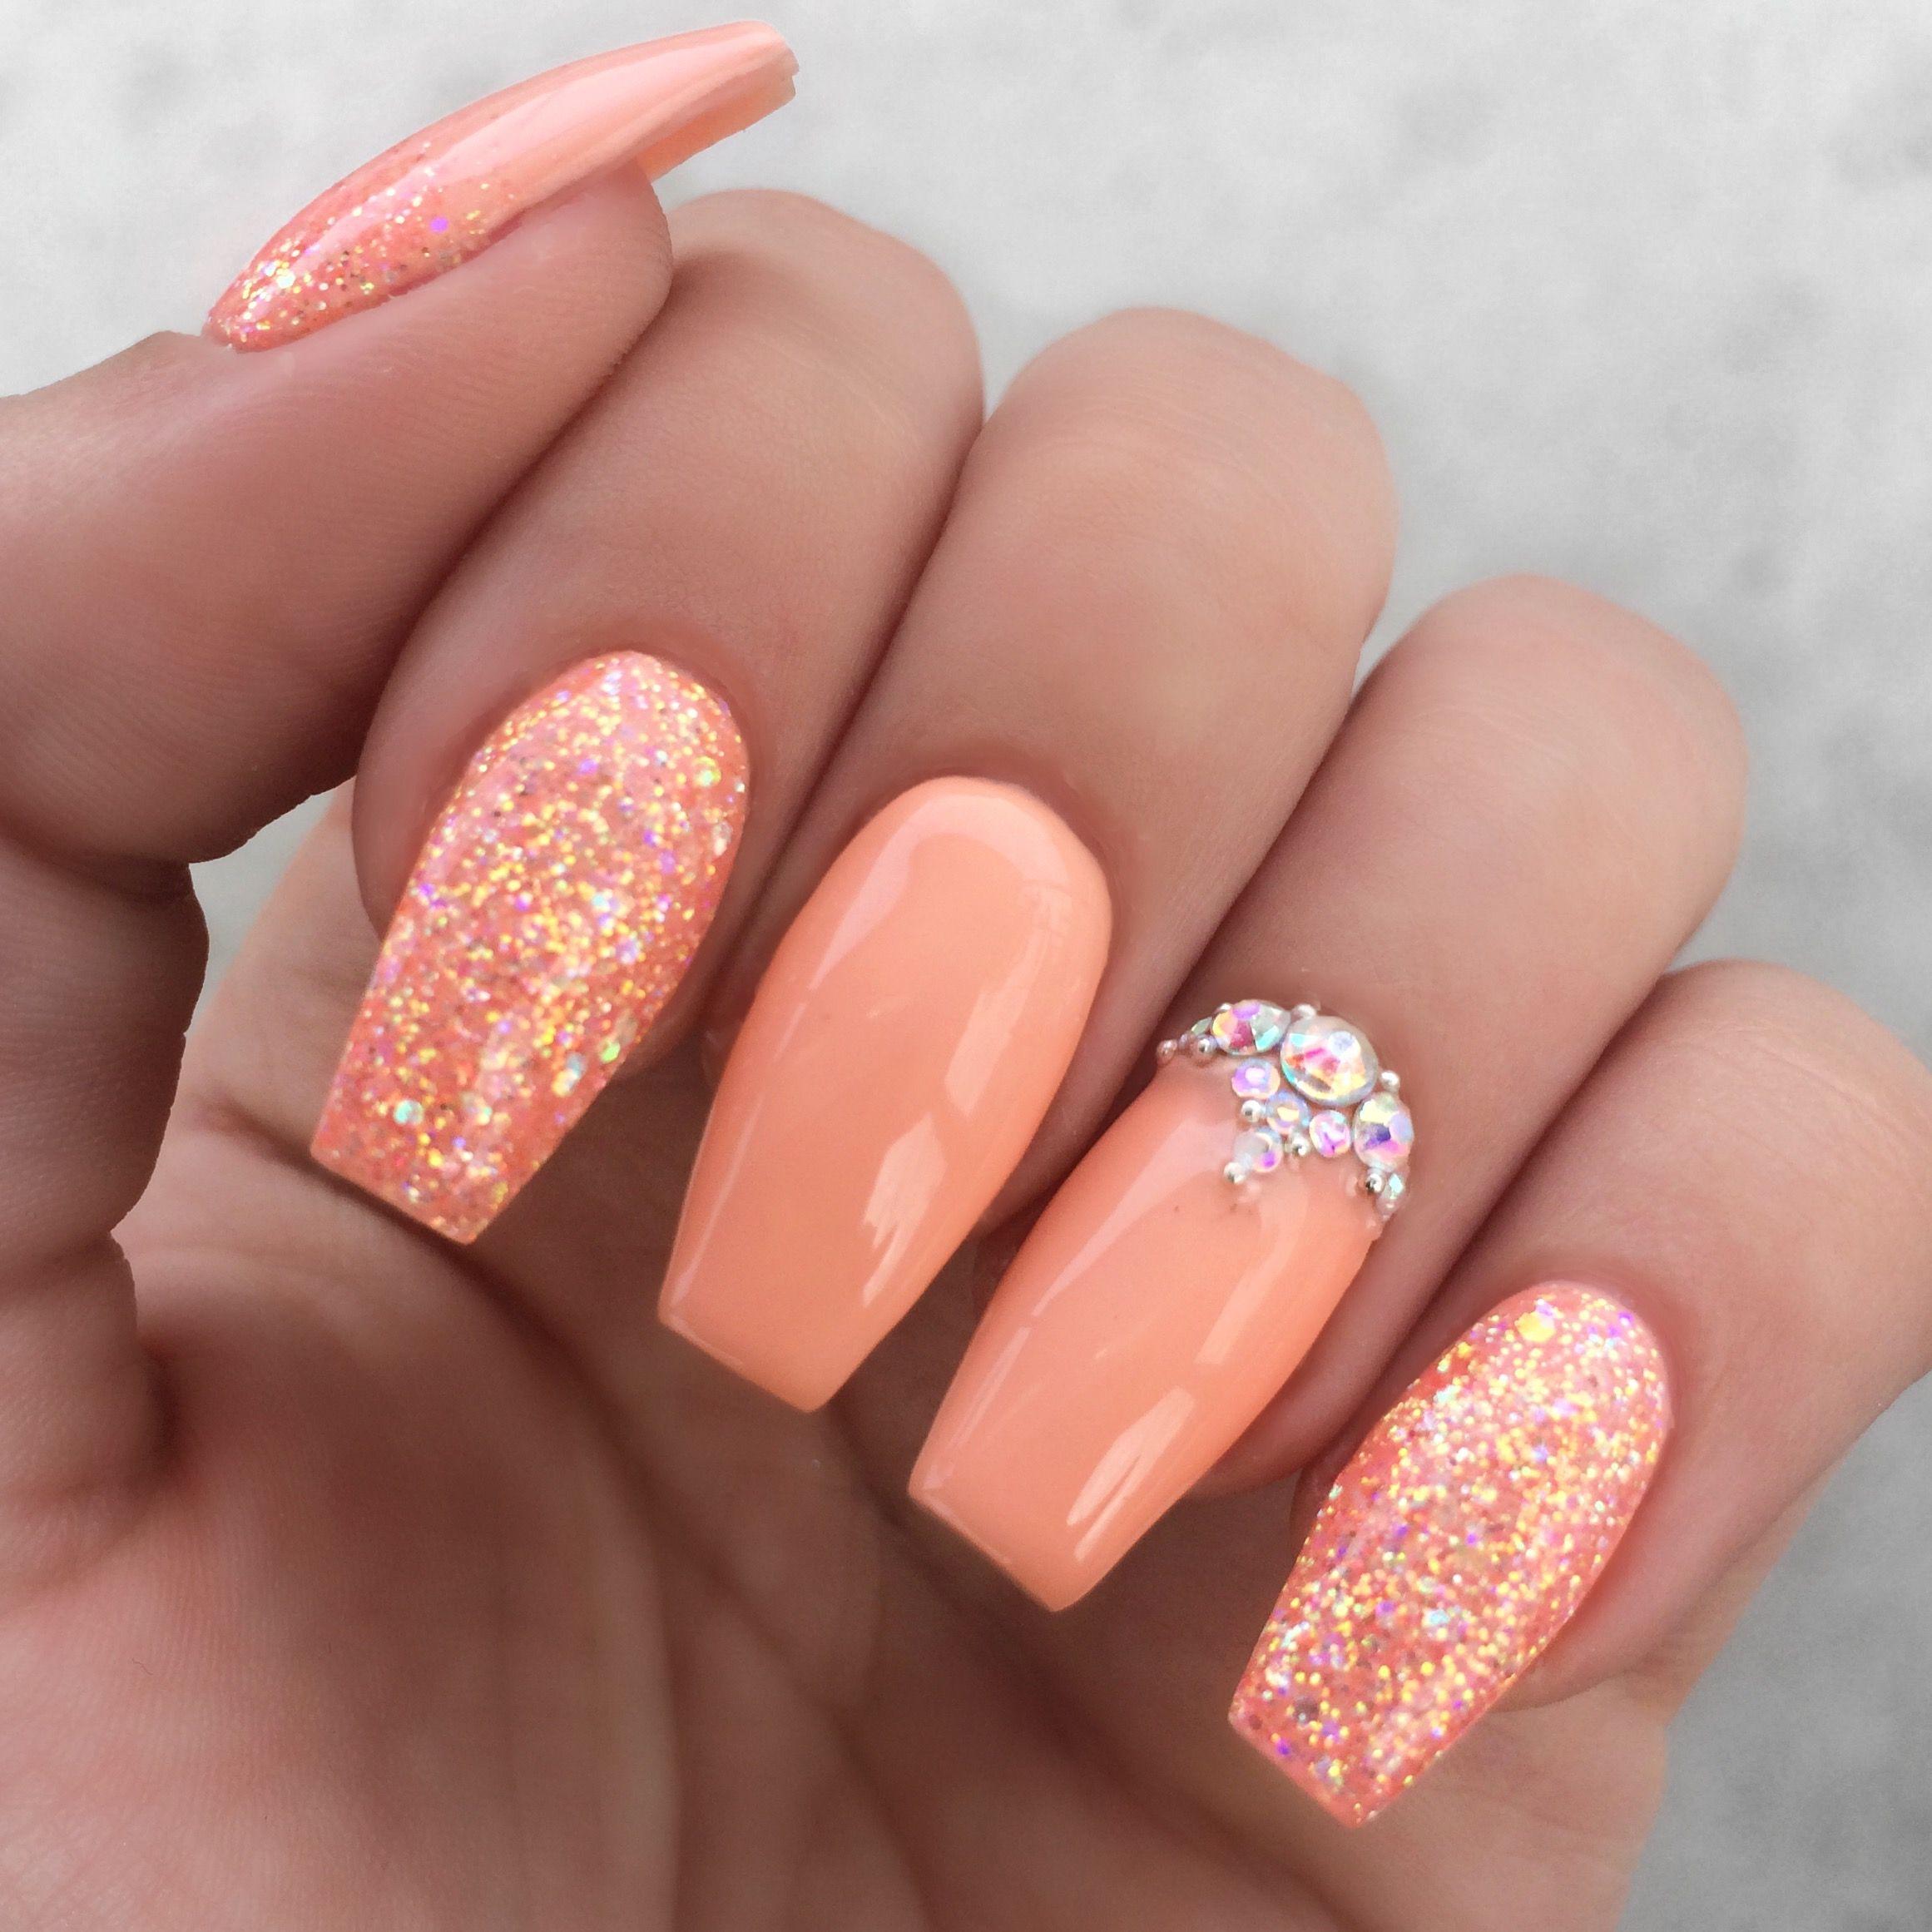 Girly peach glitter rhinestone nails | shine bright in ...